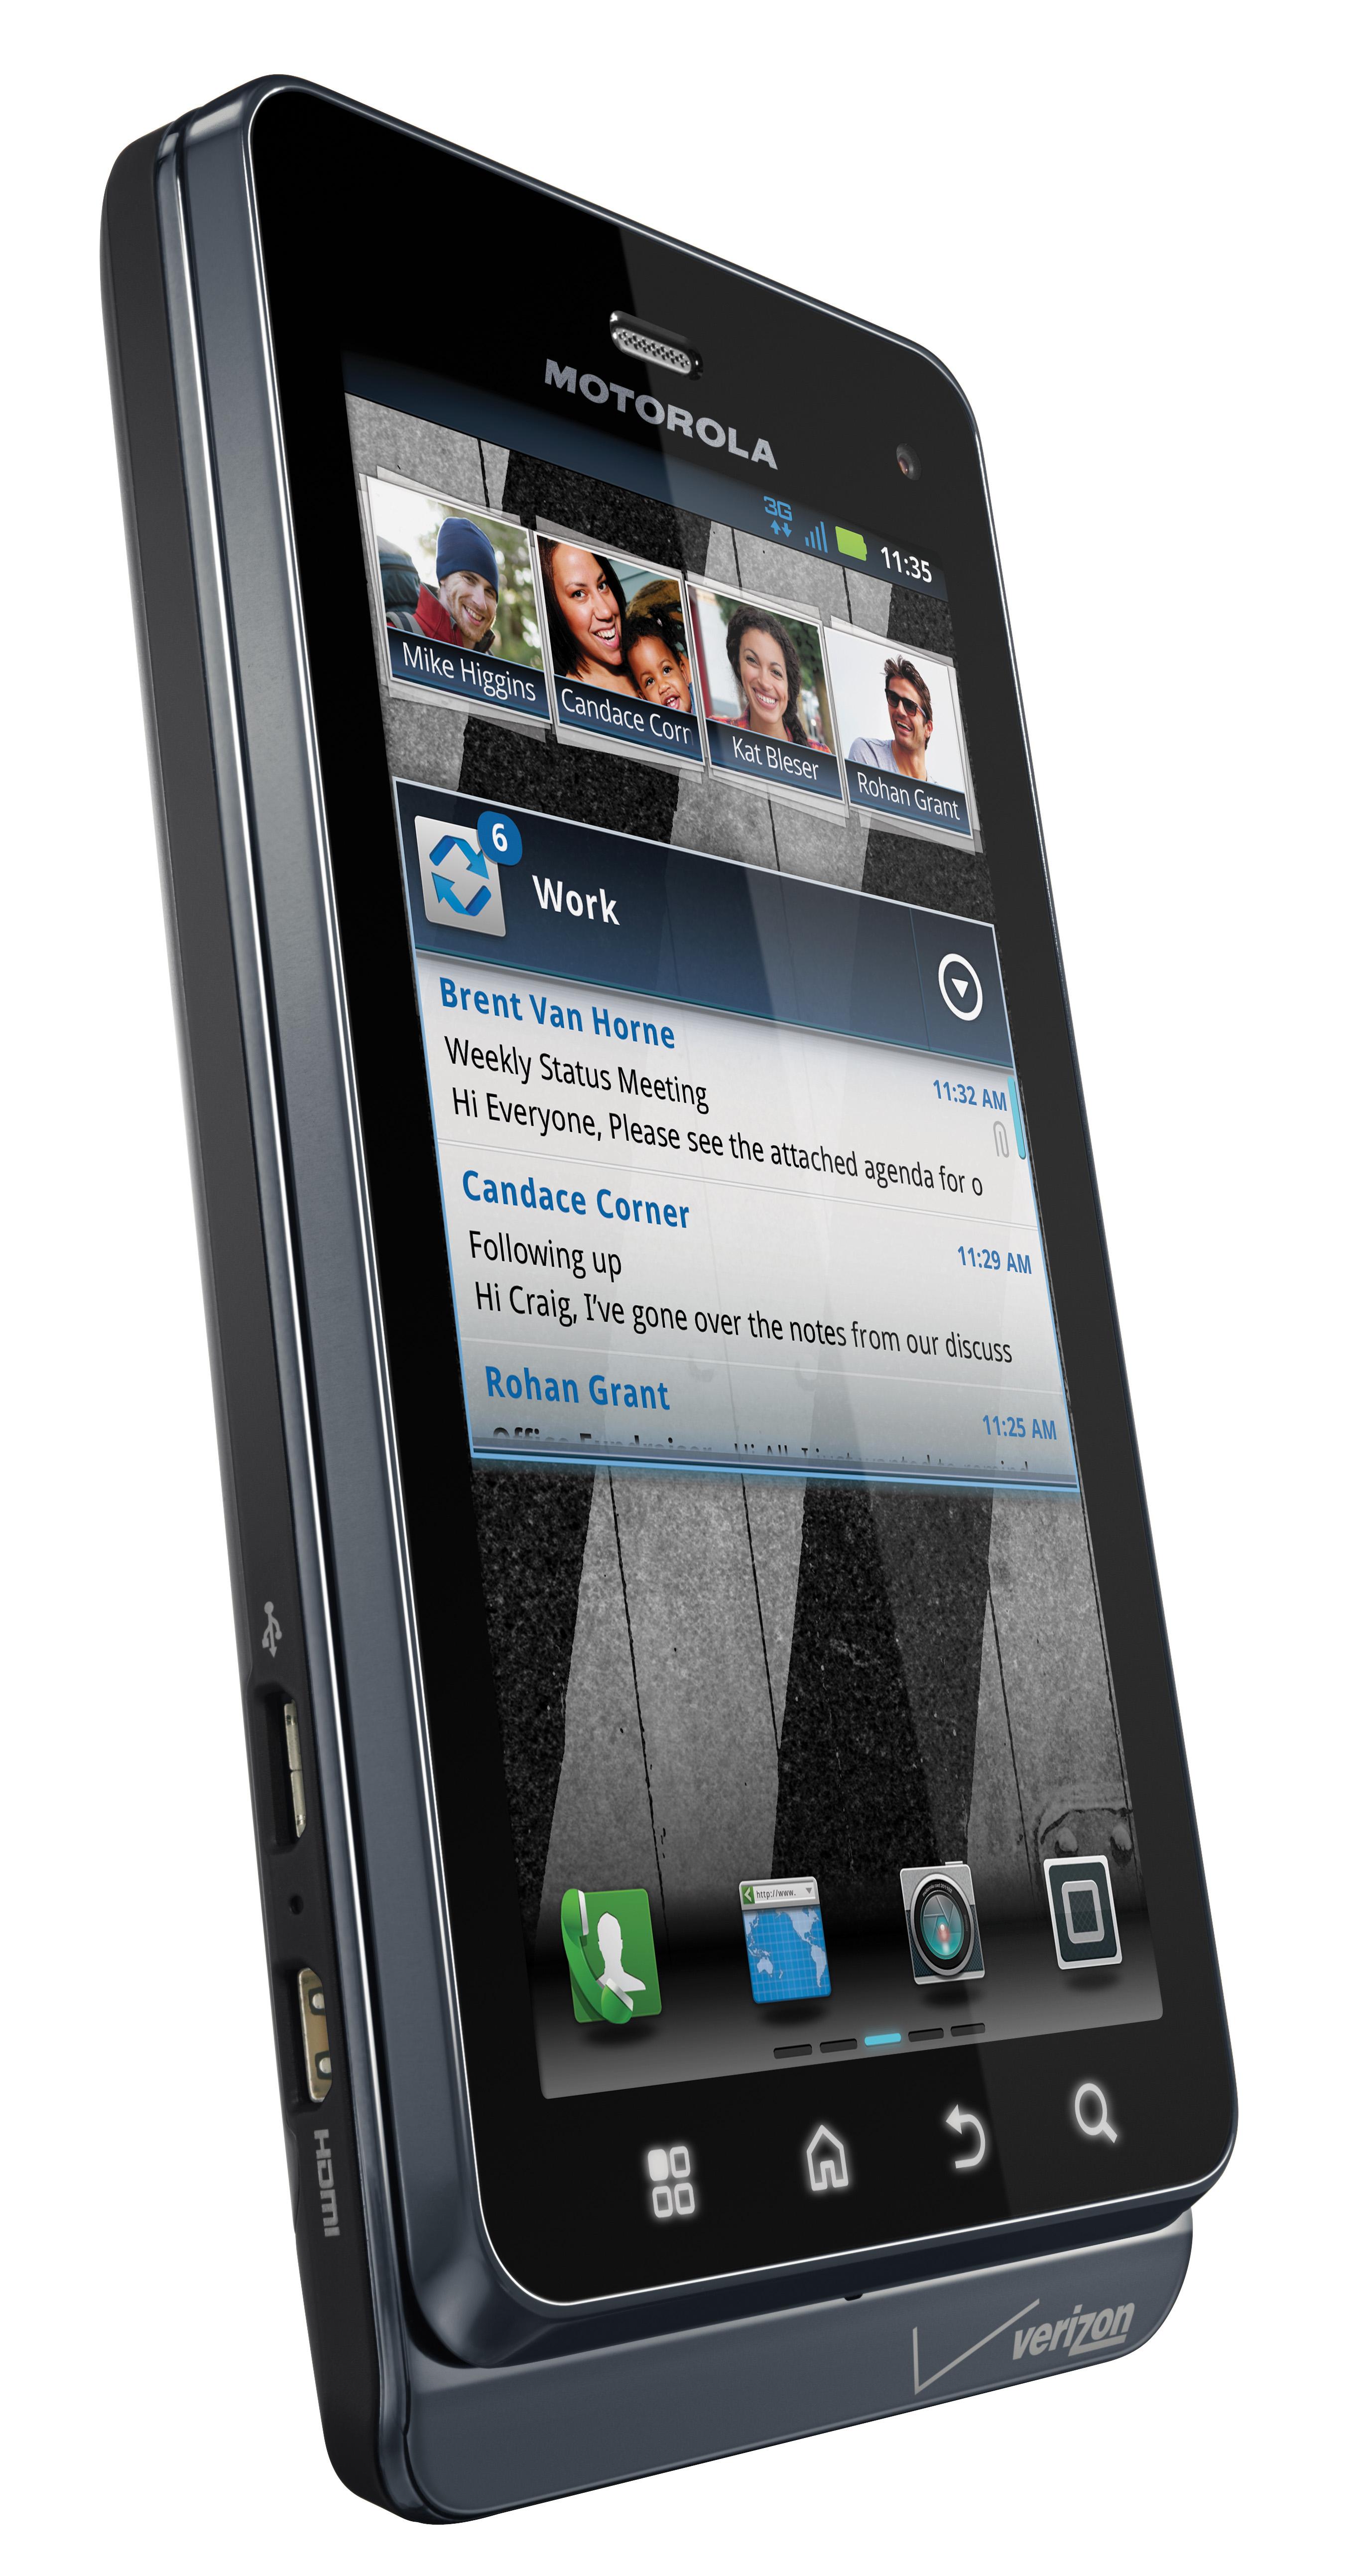 Motorola Droid 3 Global XT862 Replica Dummy Phone / Toy Phone